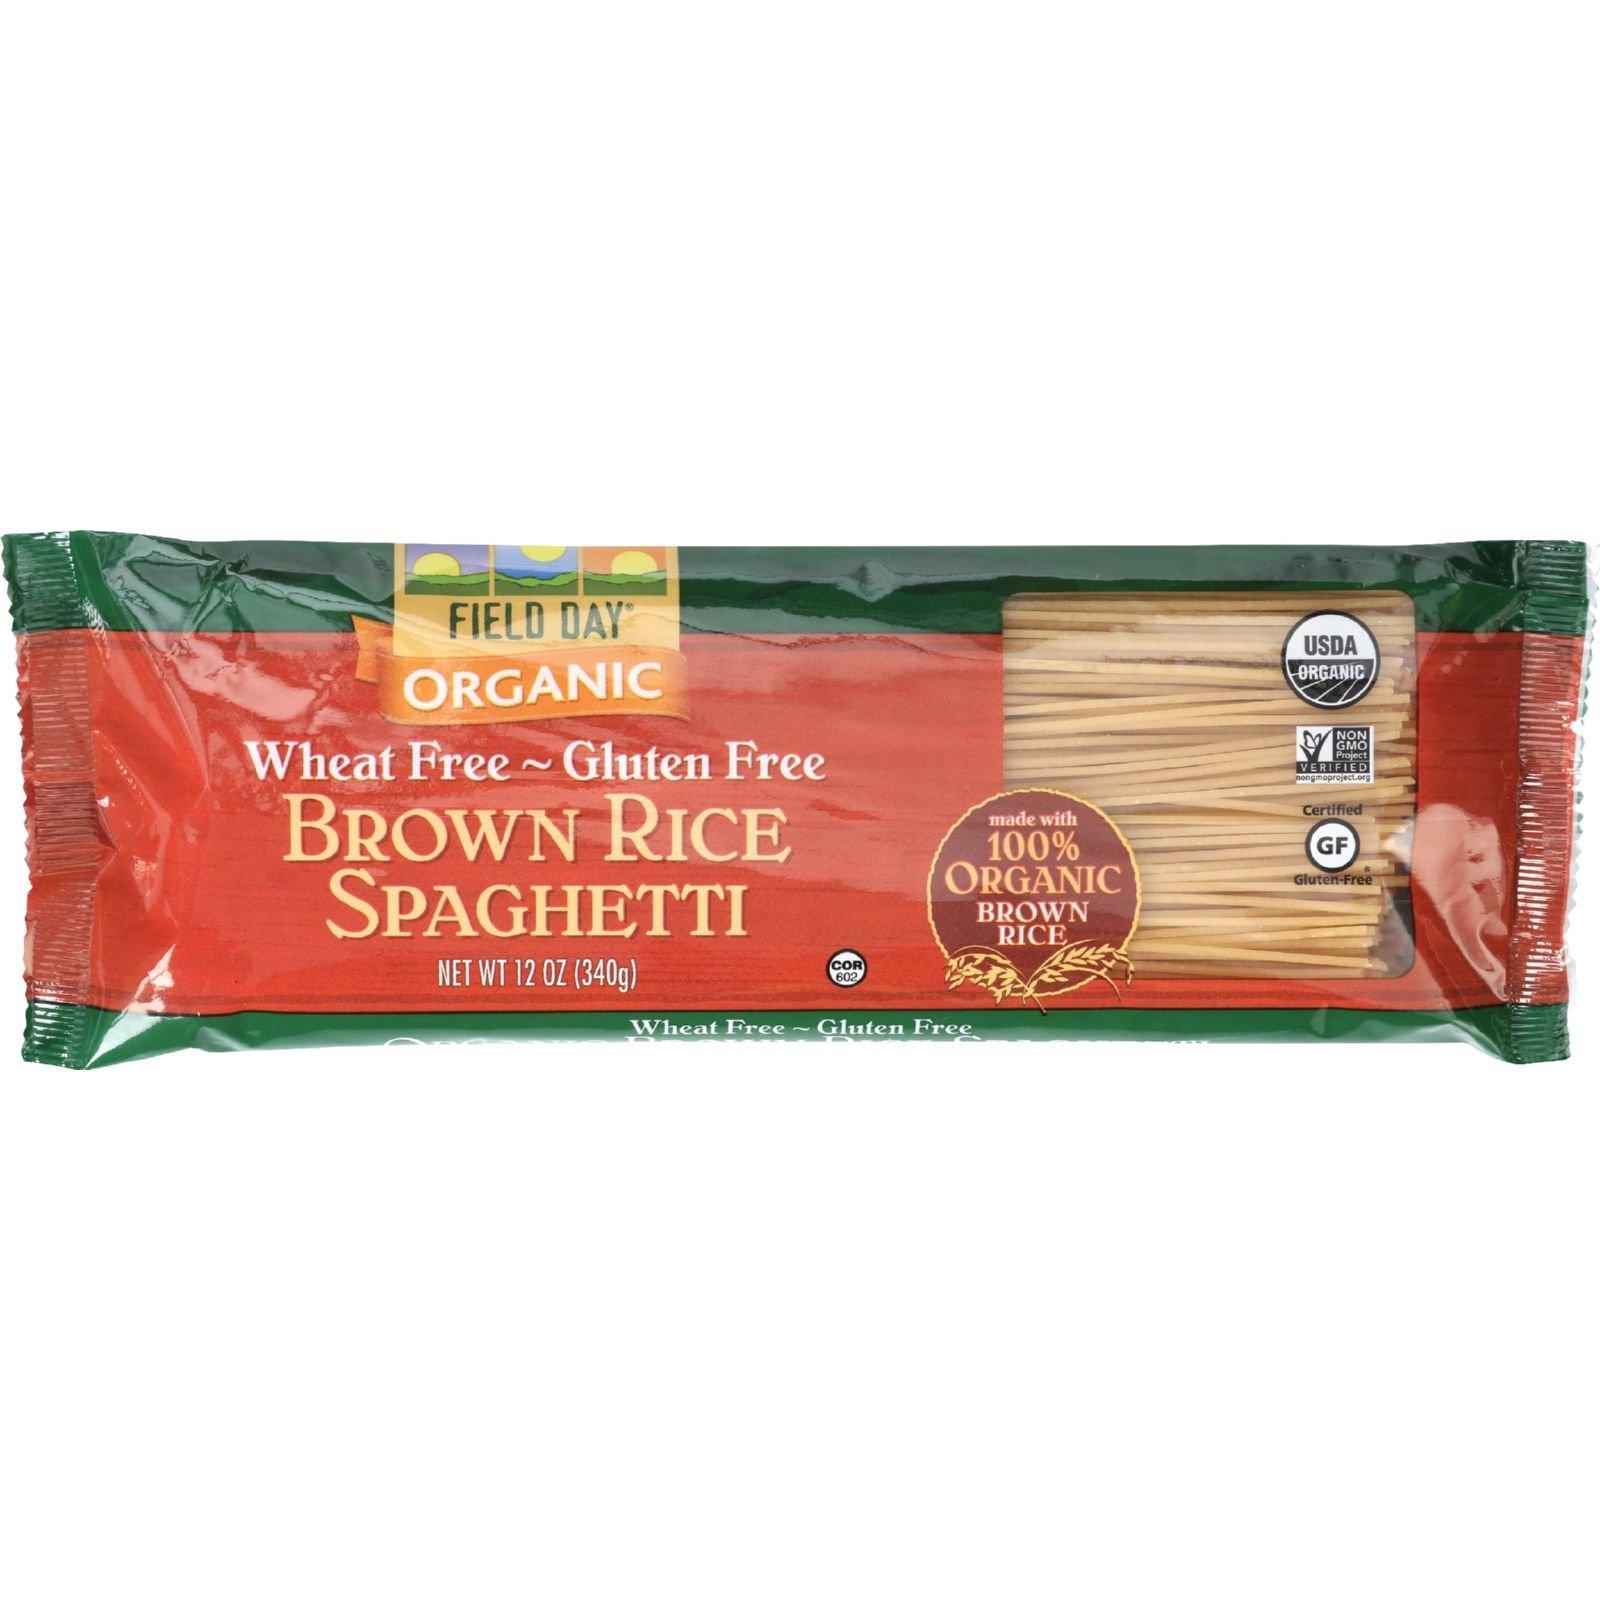 Field Day Pasta Organic Brown Rice Spaghetti, 12 Count